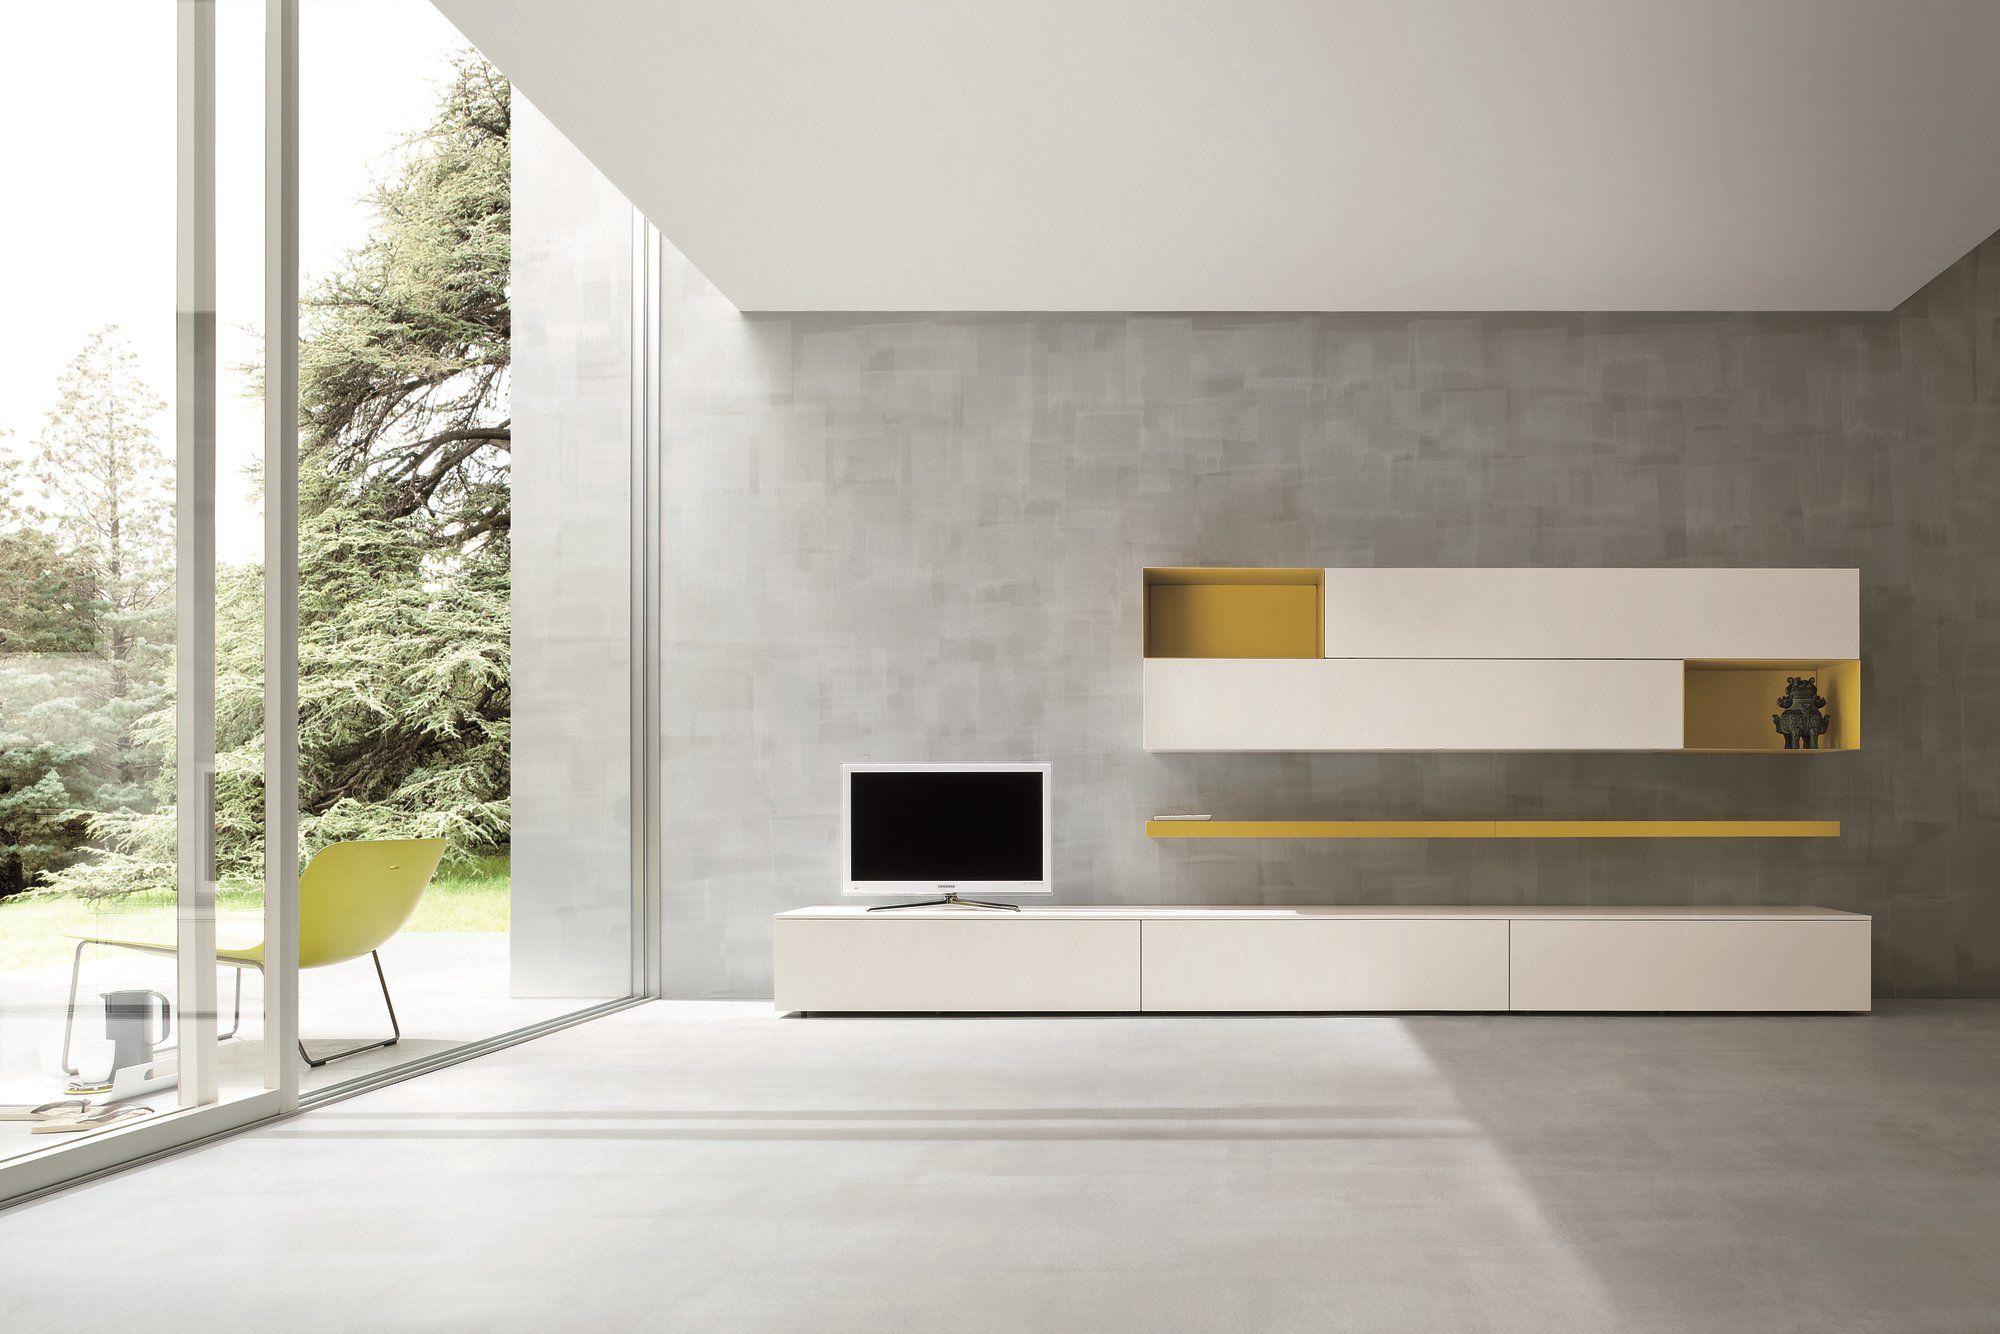 sectional tv wall system slim 2 by dall agnese design imago design massimo rosa. Black Bedroom Furniture Sets. Home Design Ideas